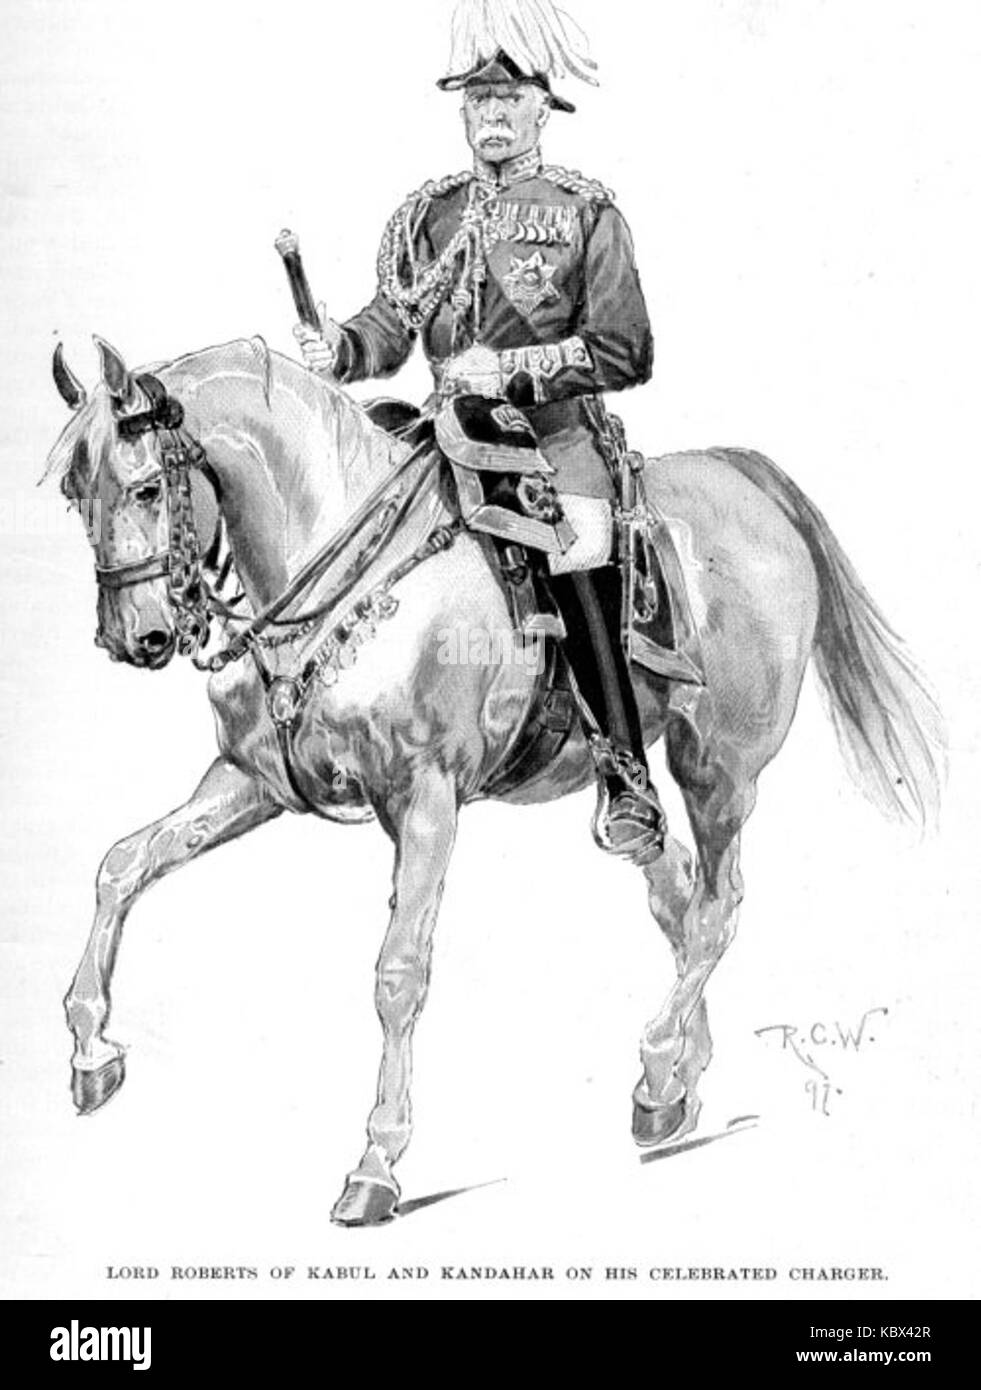 Lord roberts of kandahar - Stock Image